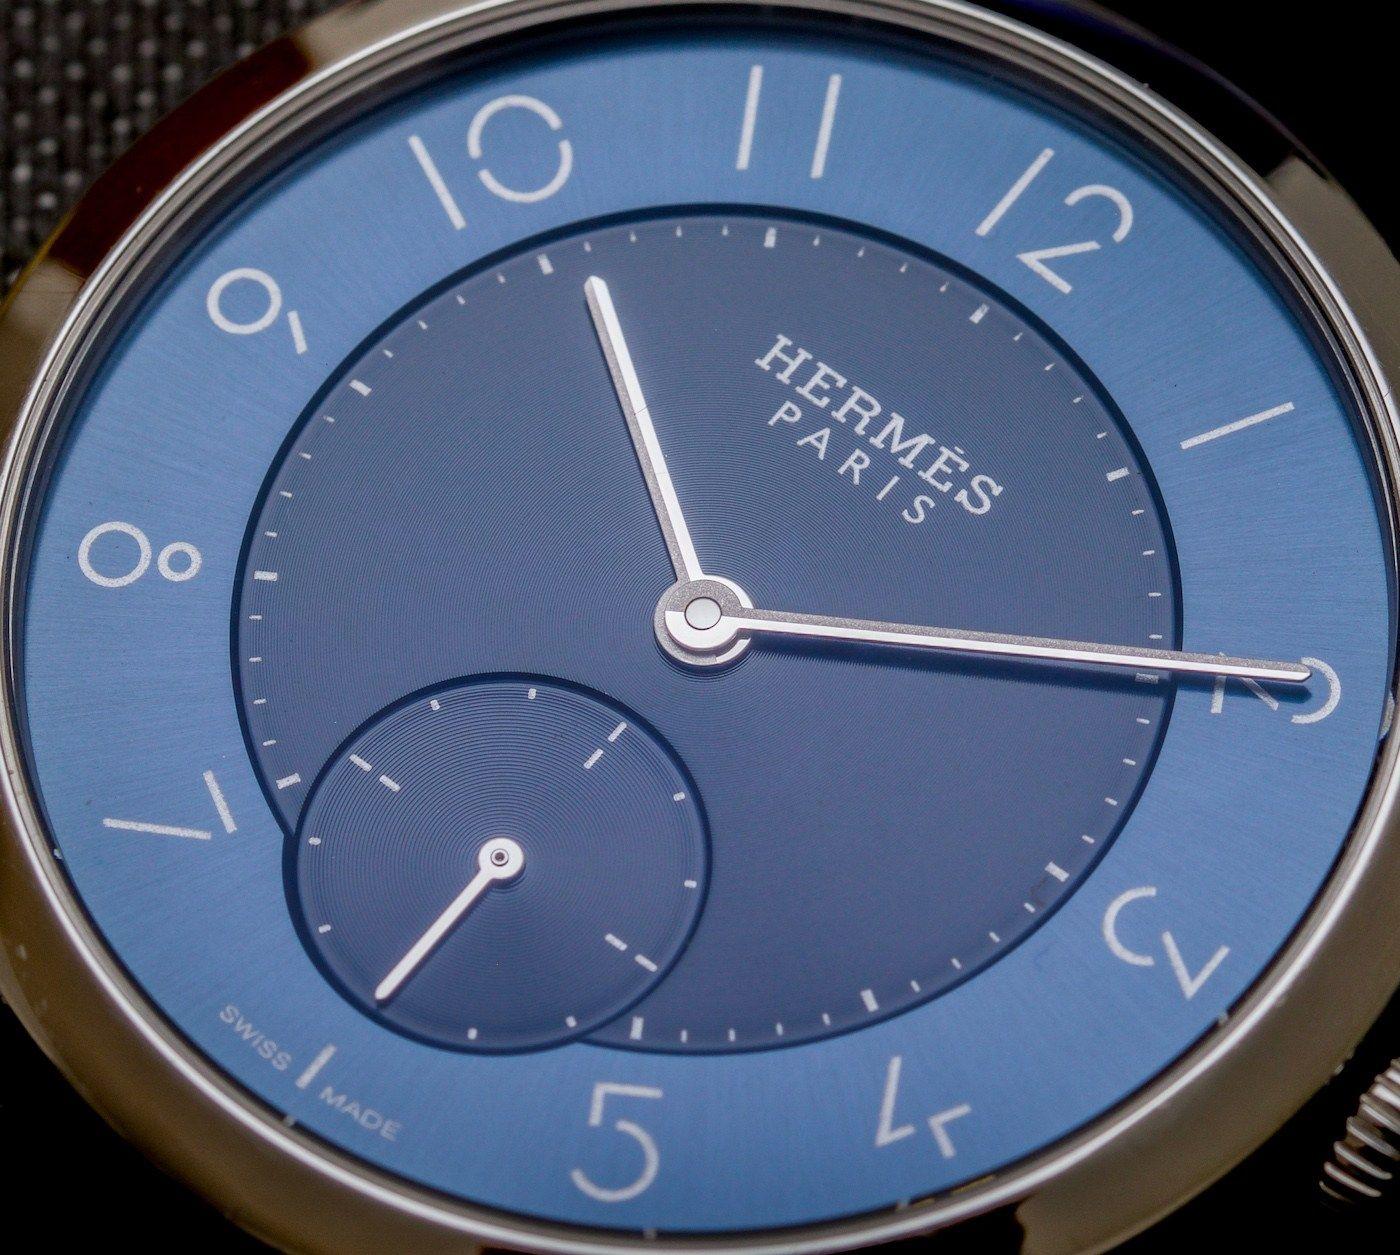 Supercar Duo Luxurycorp Rollsroyce: Hermès Slim D'Hermès Watch Review: The Verdict Three Years